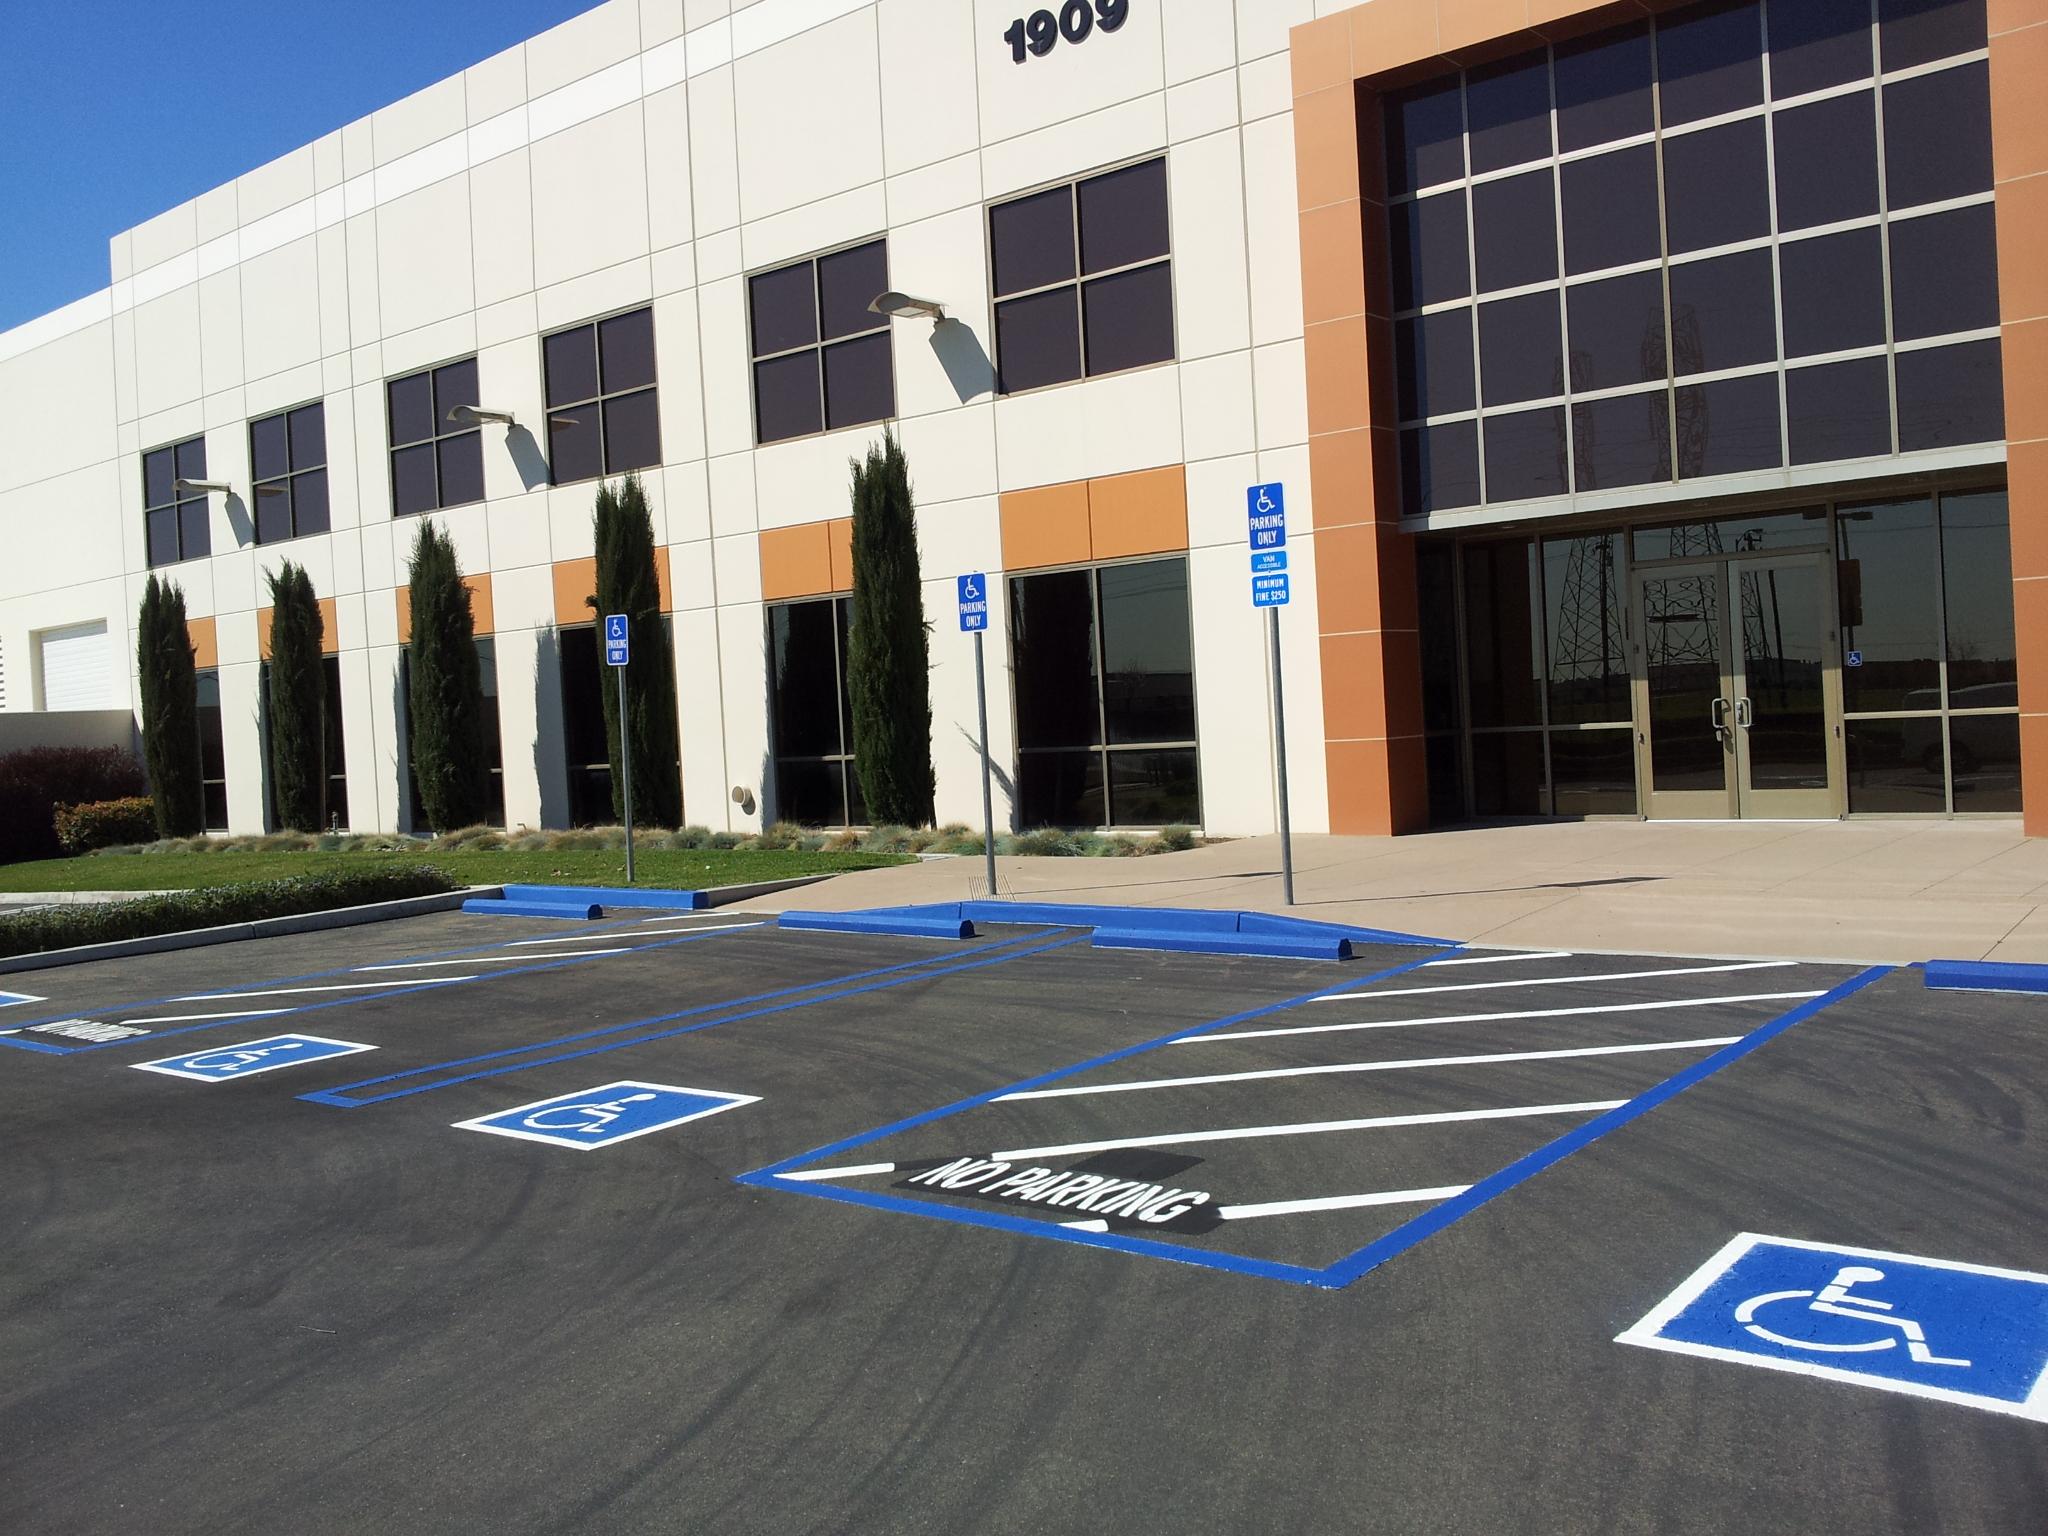 Custom Curb Painting, Handicap, ADA Upgrades, Crackfill, Patching ...